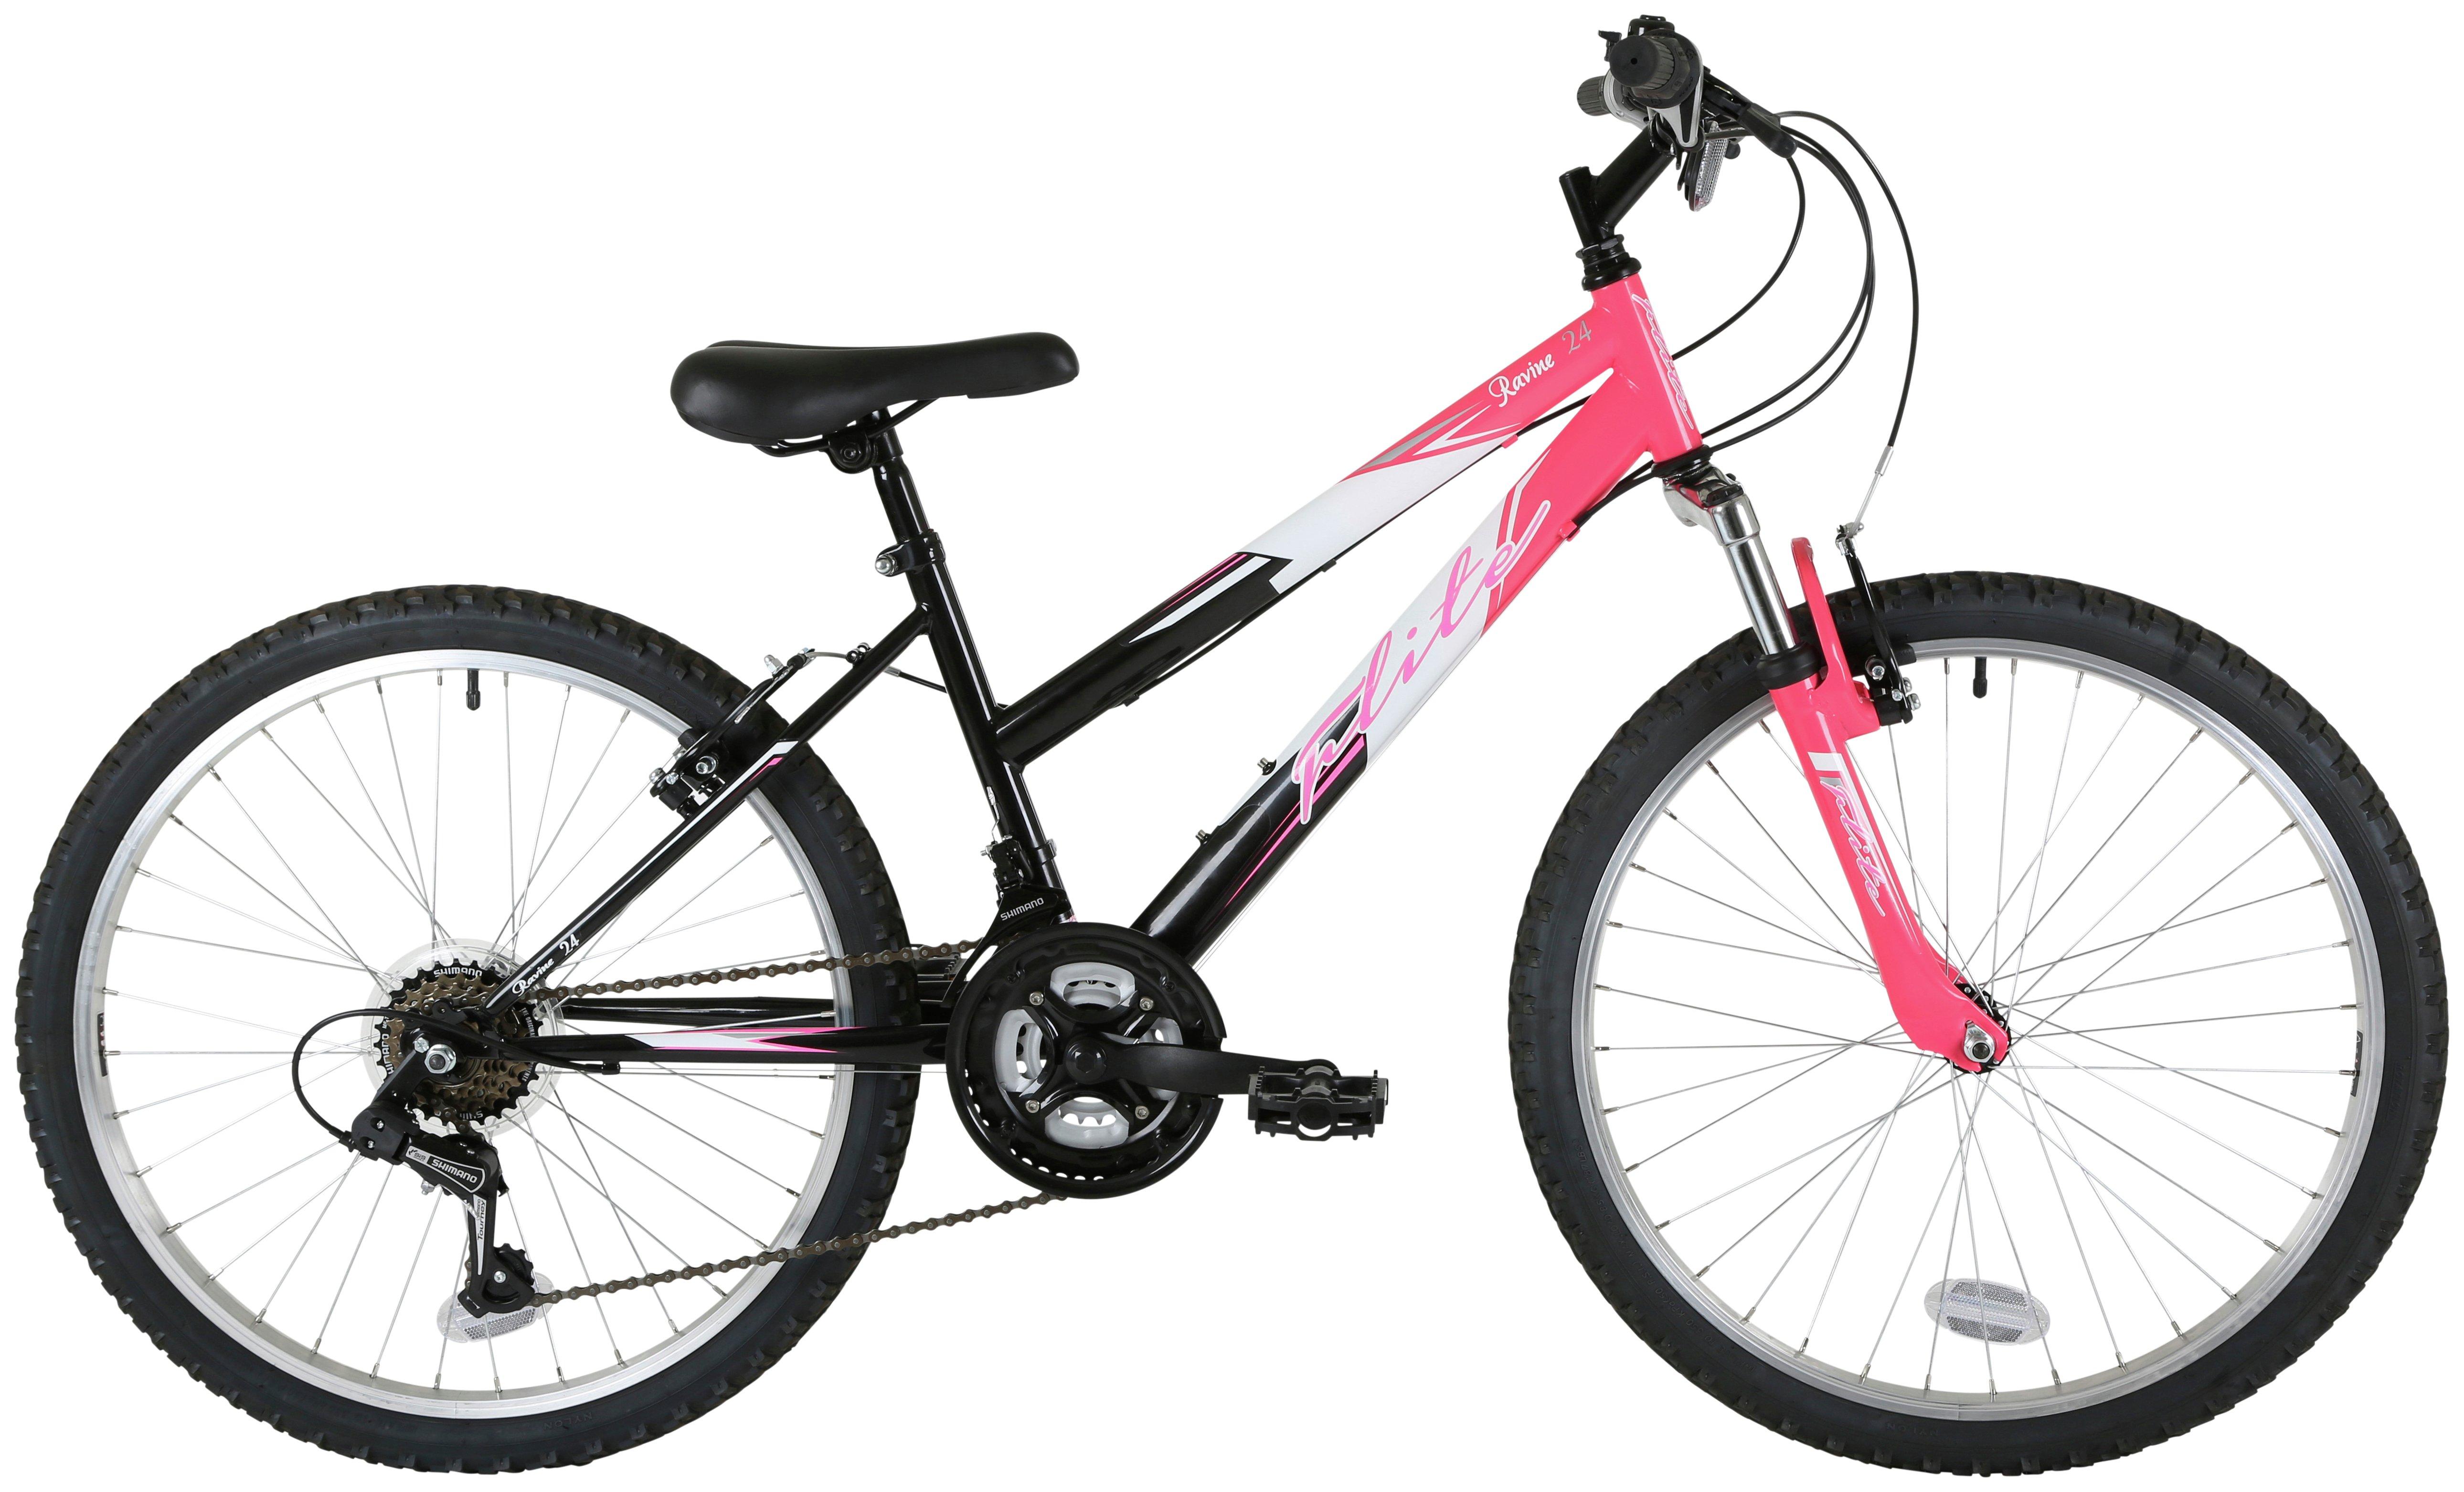 Image of Flite Ravine 14 Inch Mountain Bike - Girls.